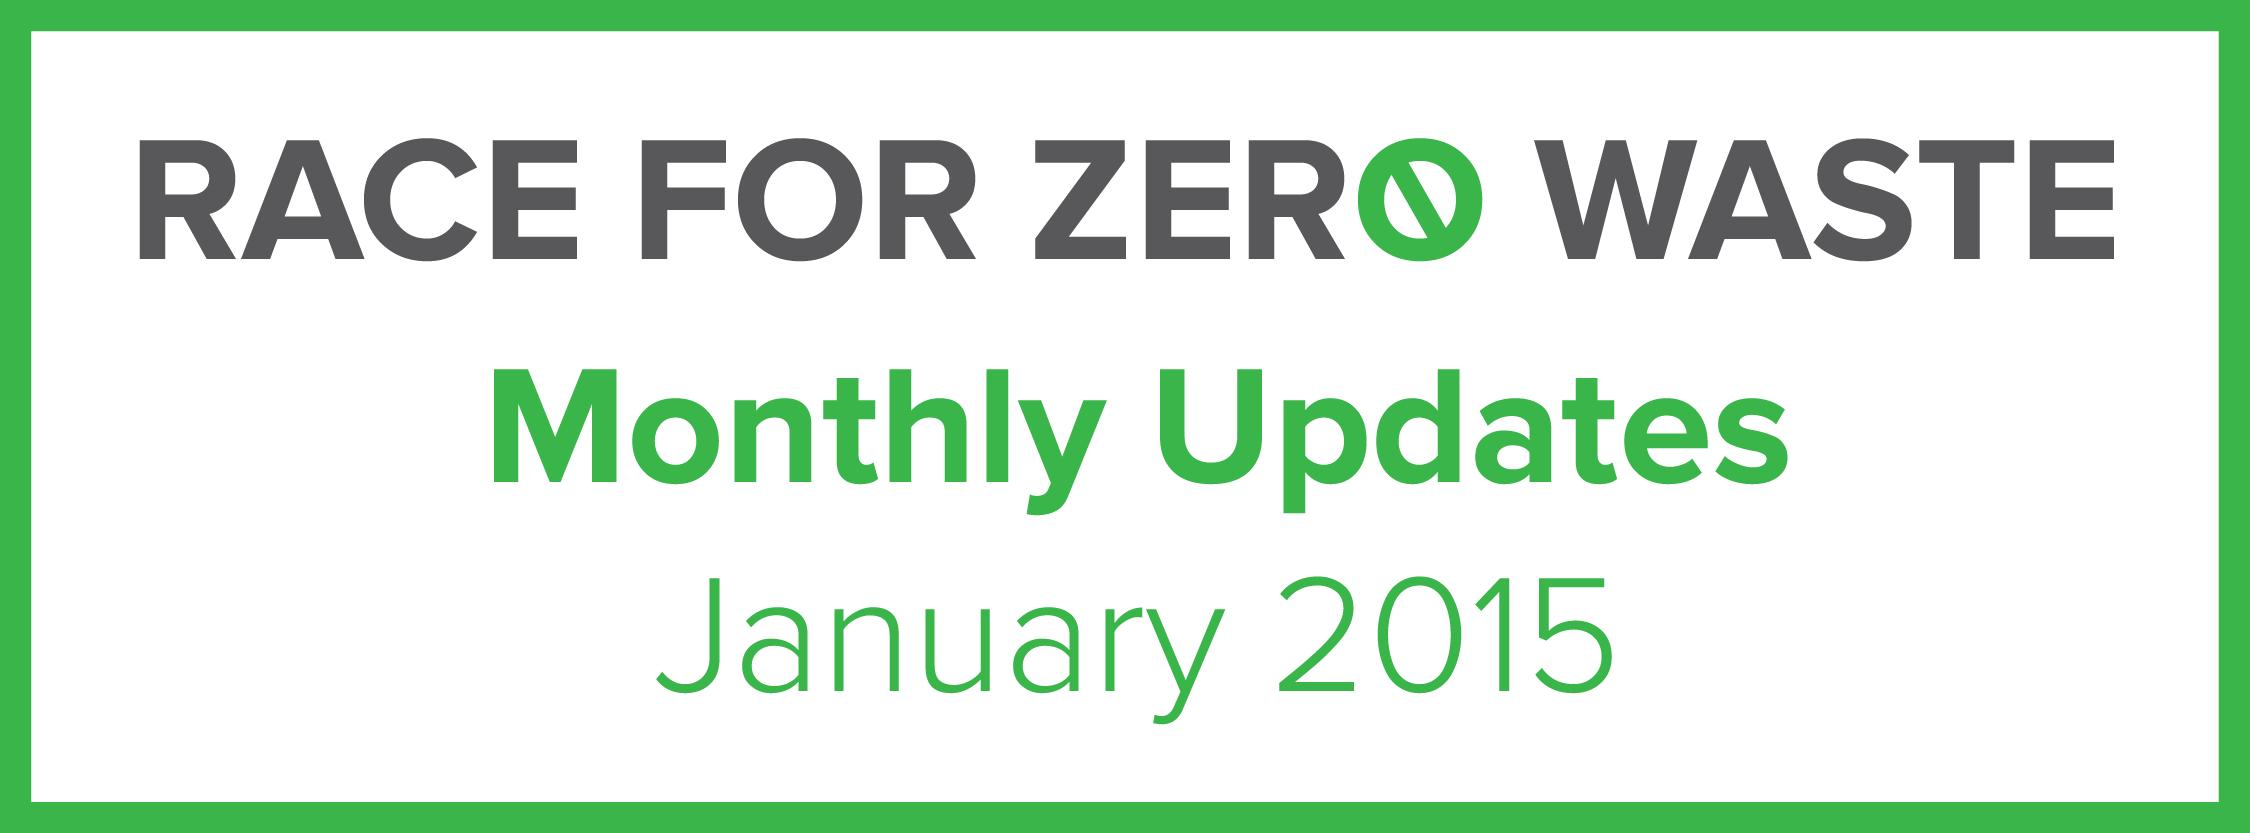 Monthly Updates Jan 15 Header.png